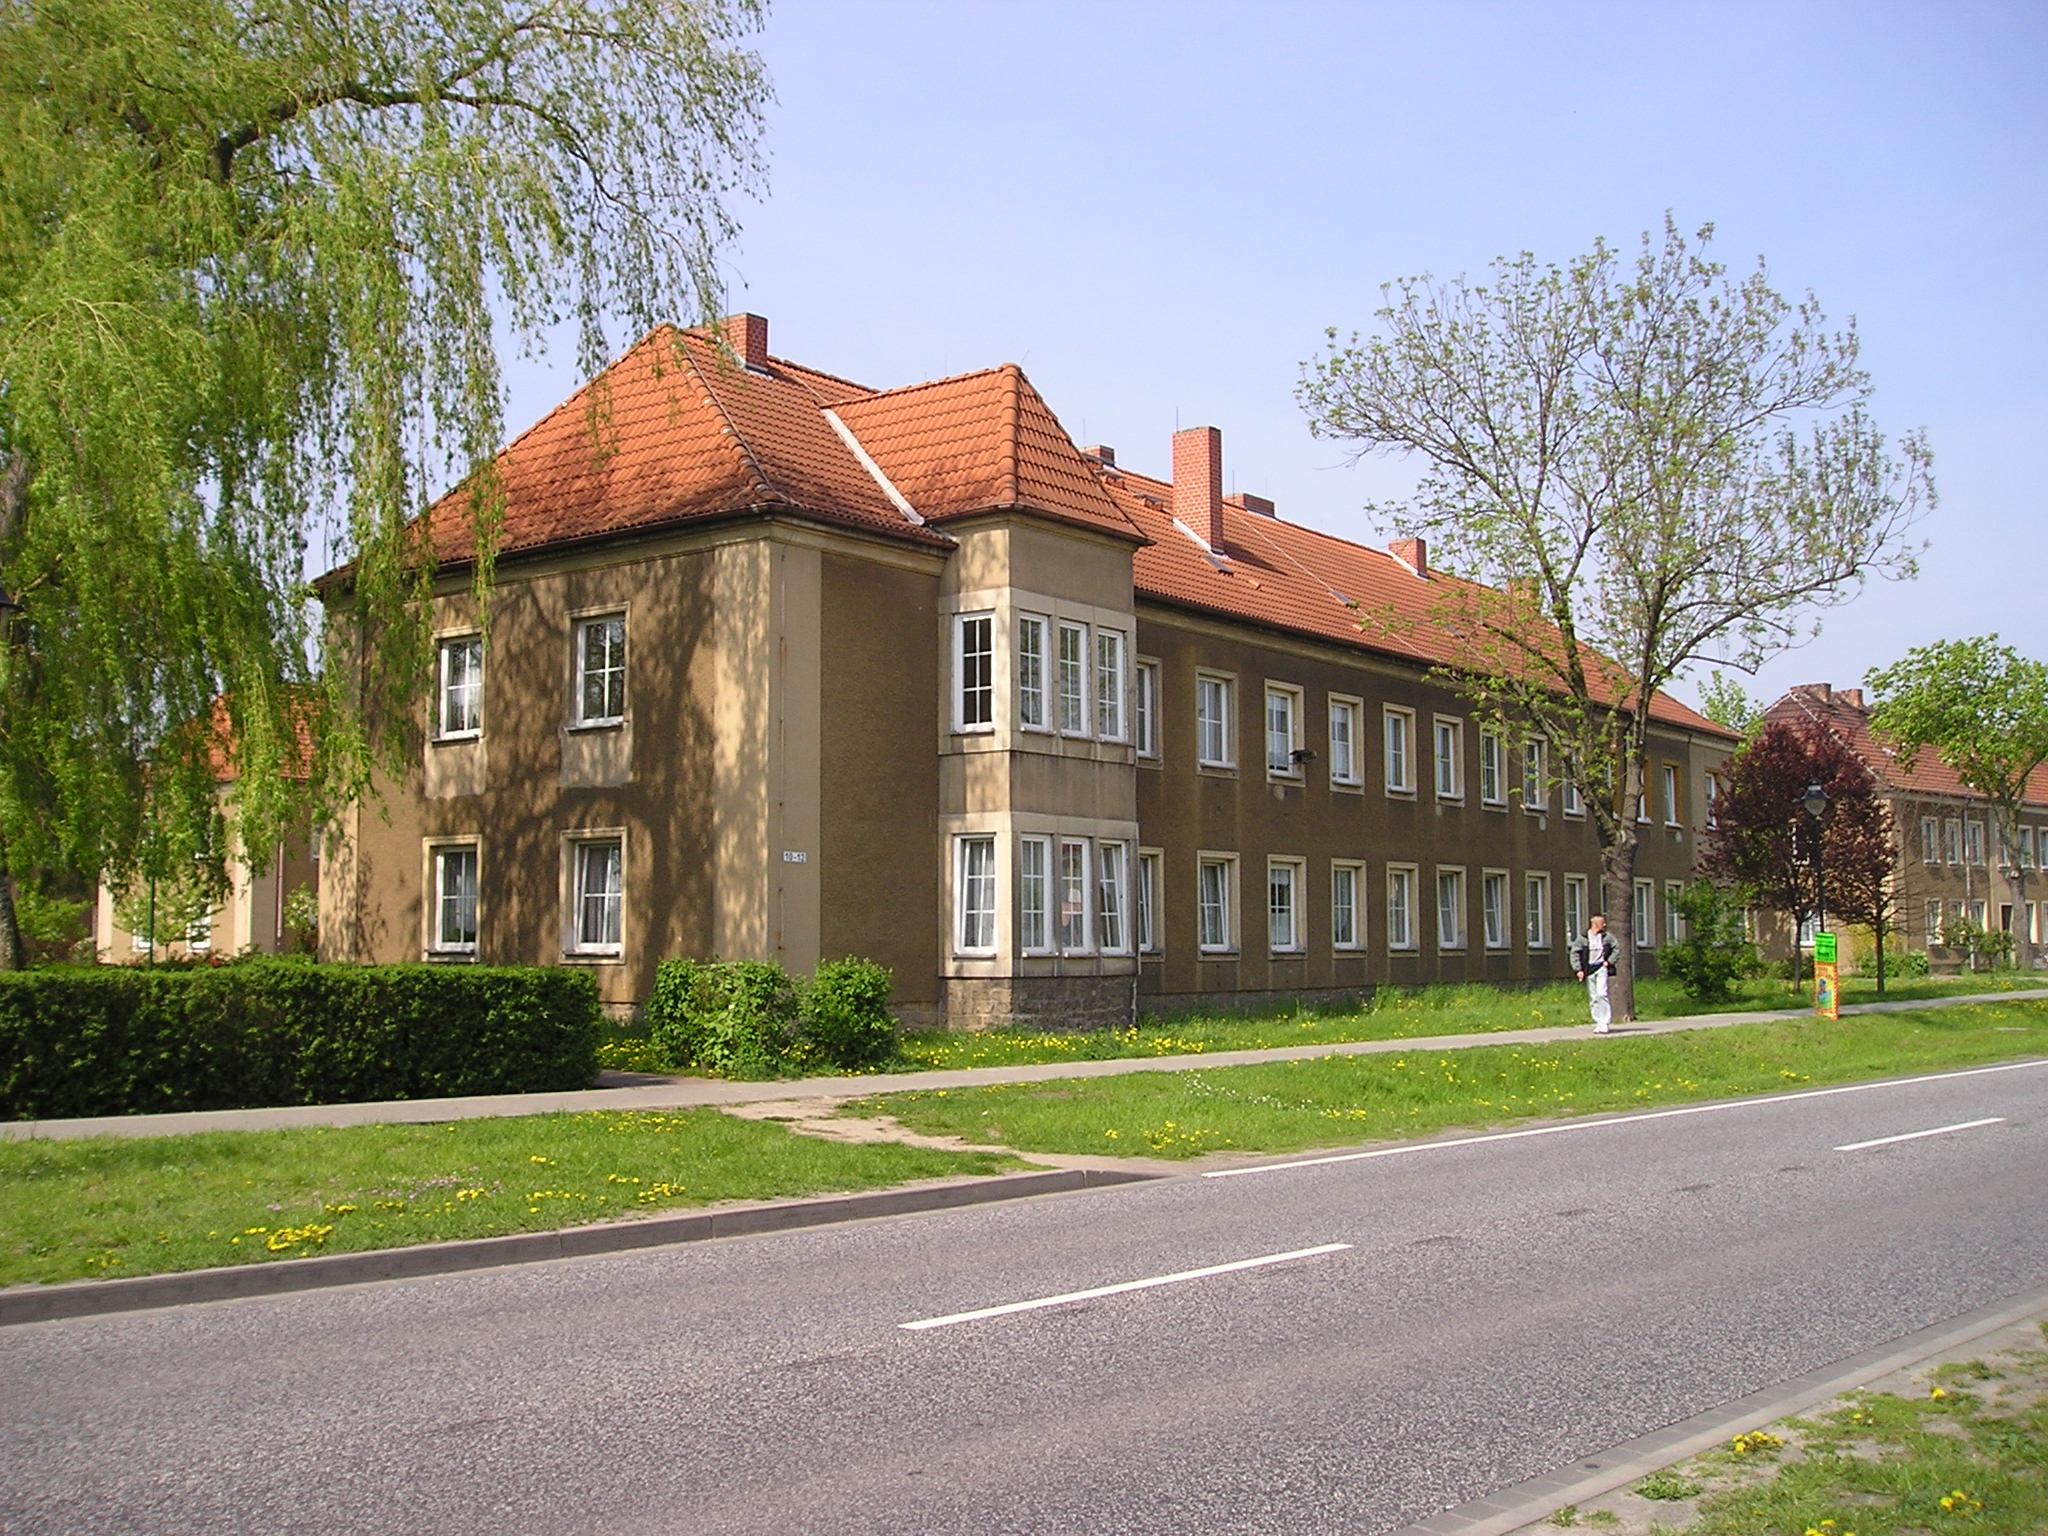 Wohnung - Magdeburger Straße 12